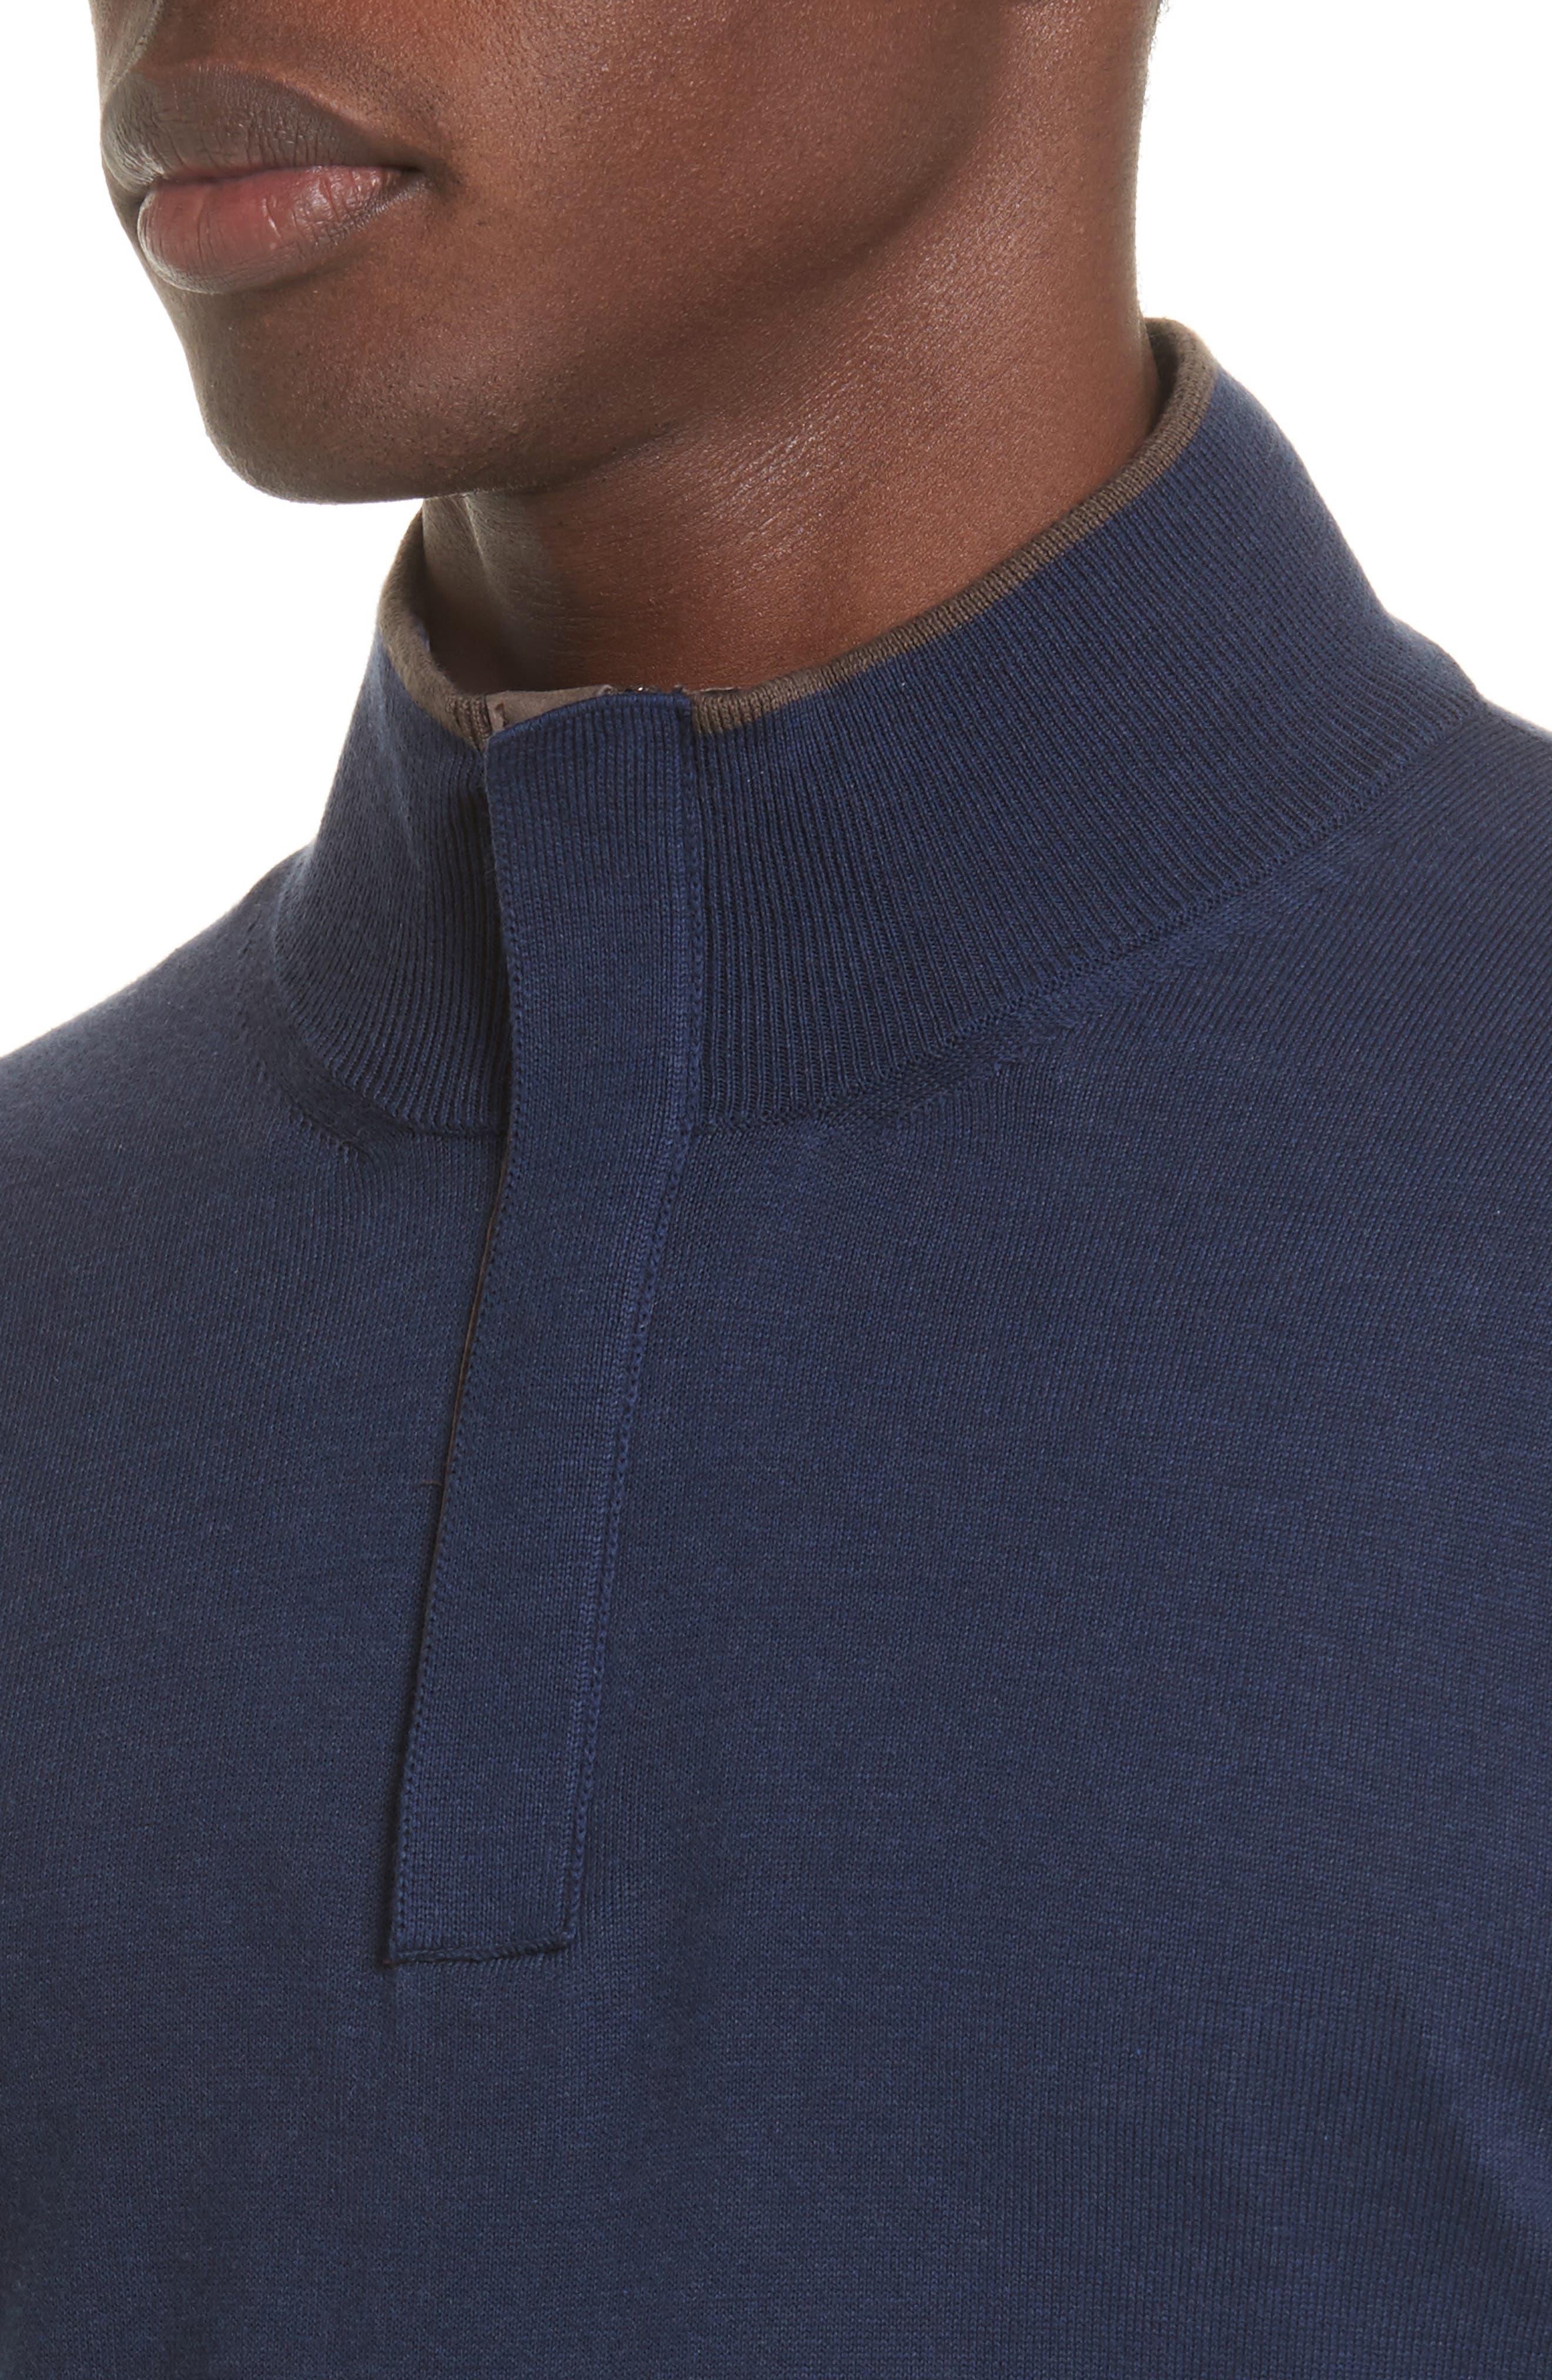 Quarter Zip Sweater,                             Alternate thumbnail 4, color,                             Dark Blue